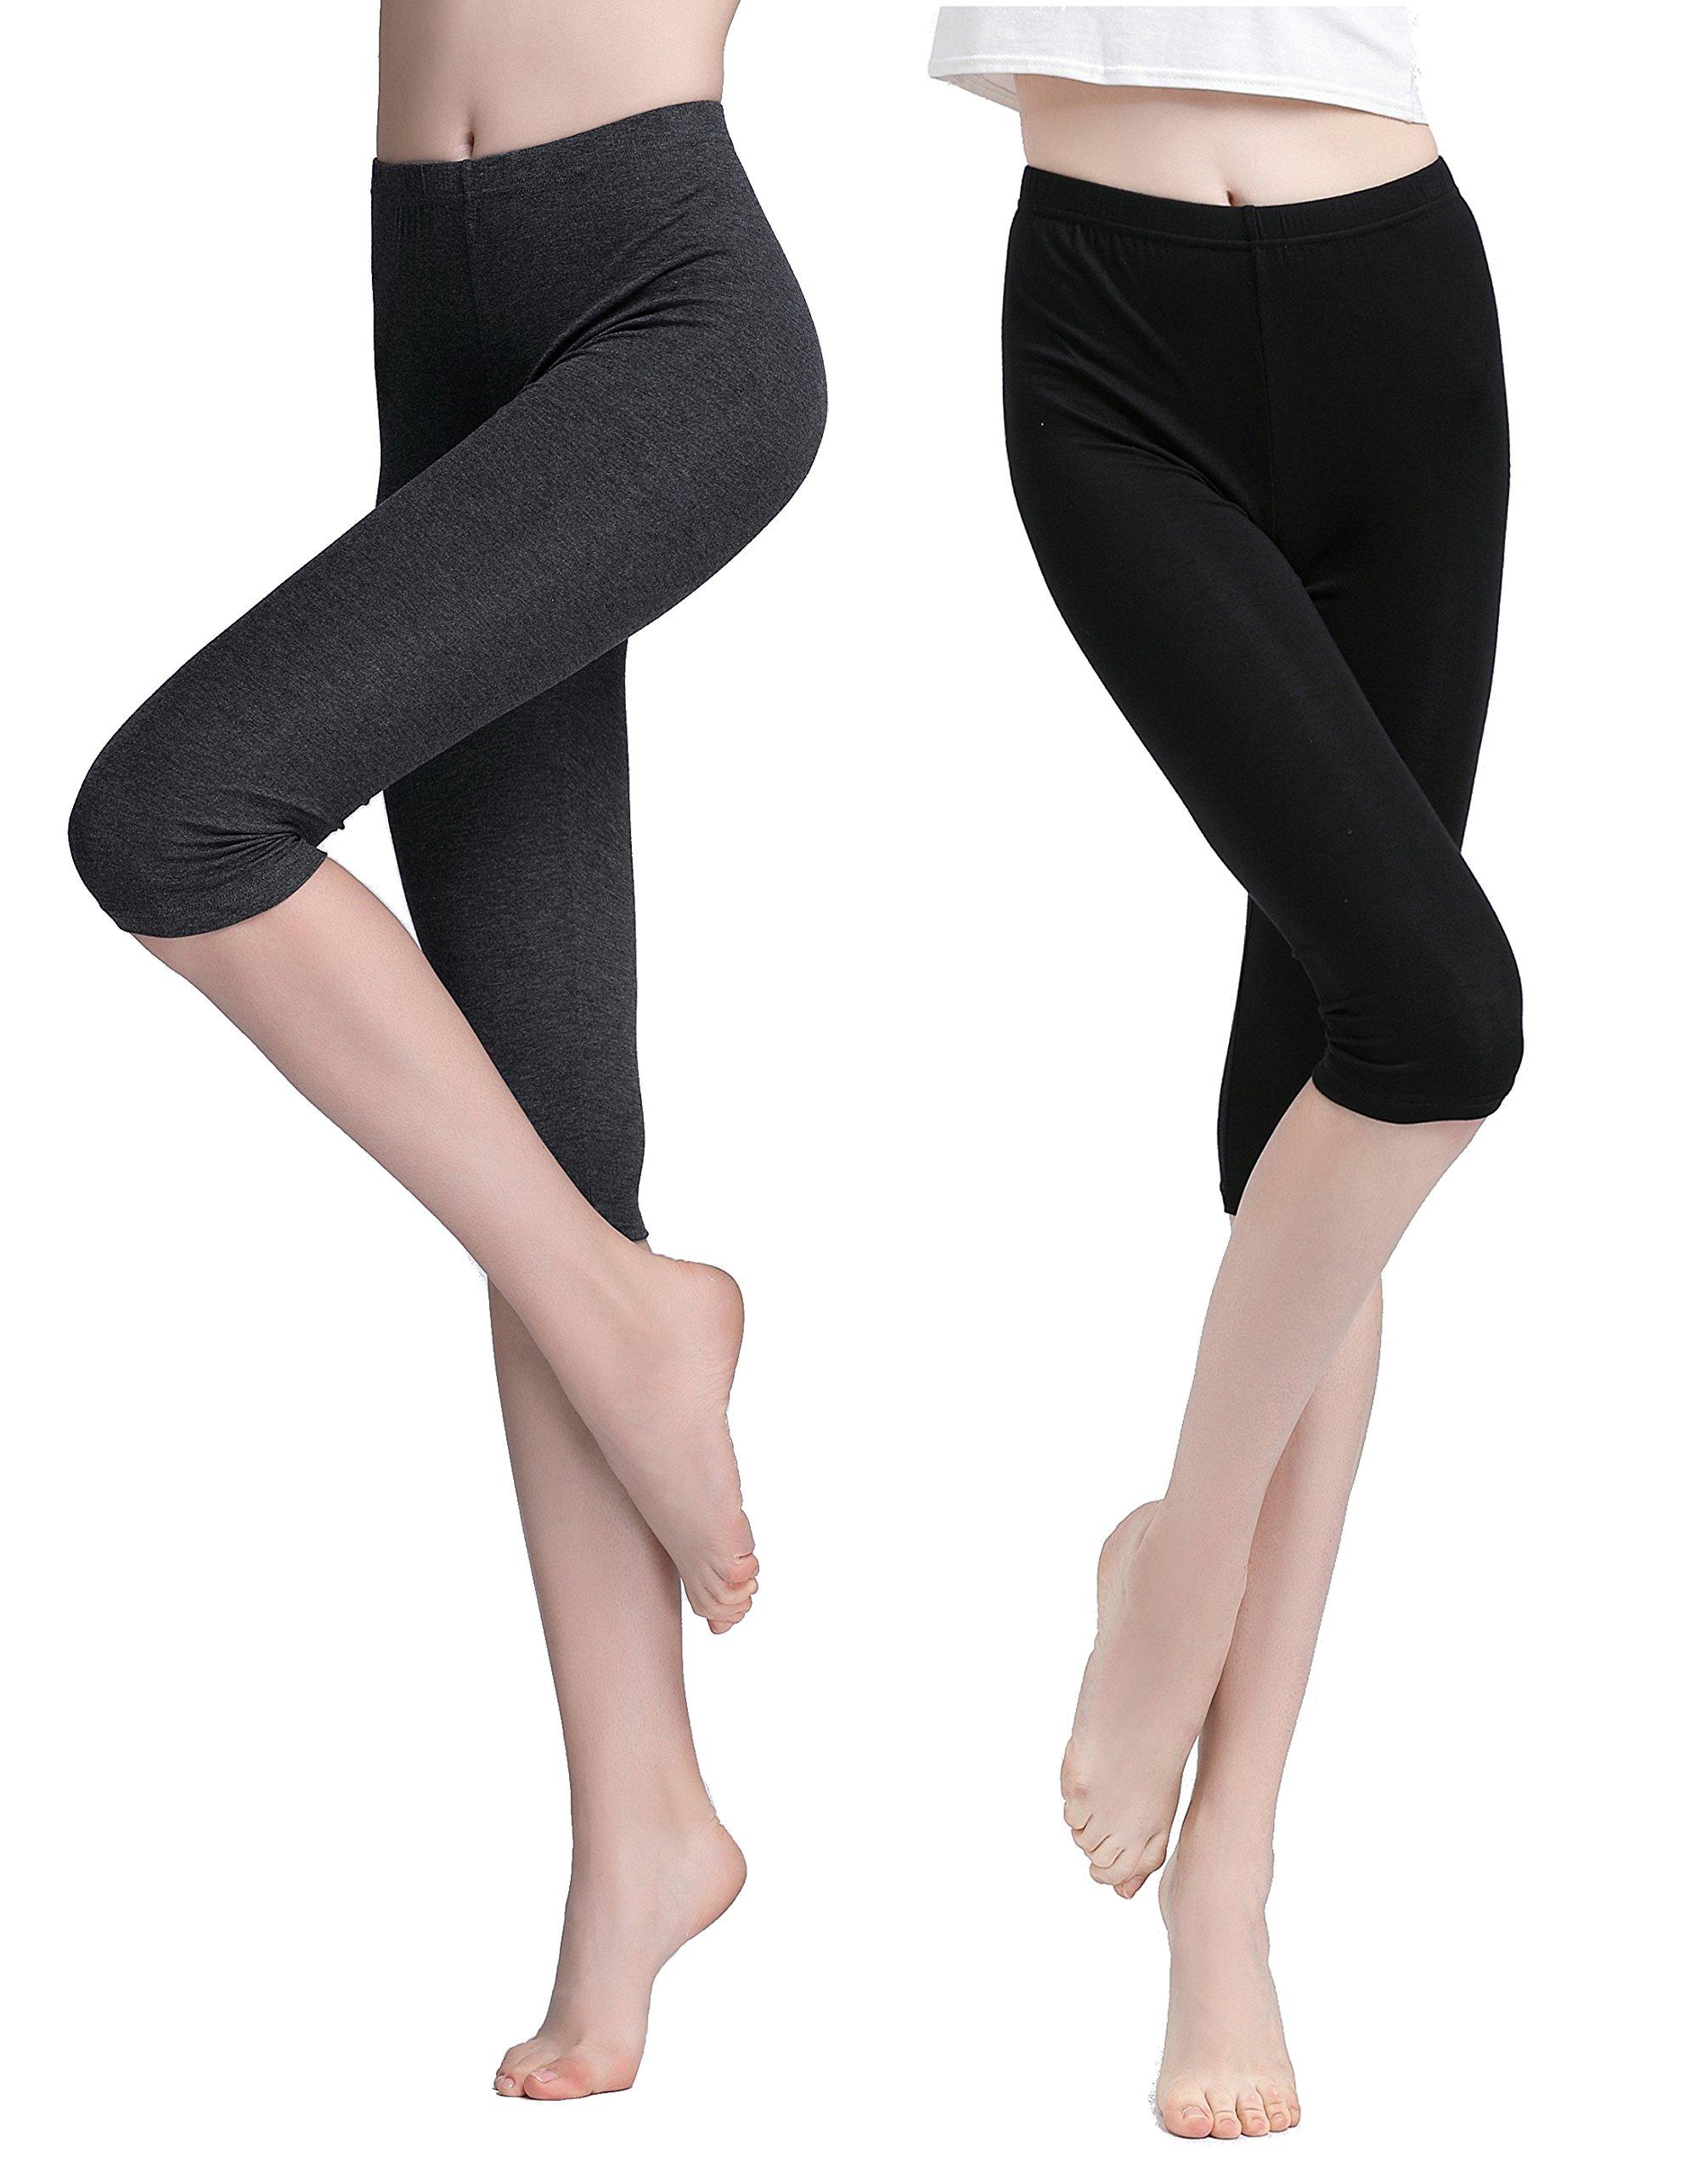 Vinconie Women Activewear Capris Stretchy Exercises Sexy Workout Leggings Soft by Vinconie (Image #1)